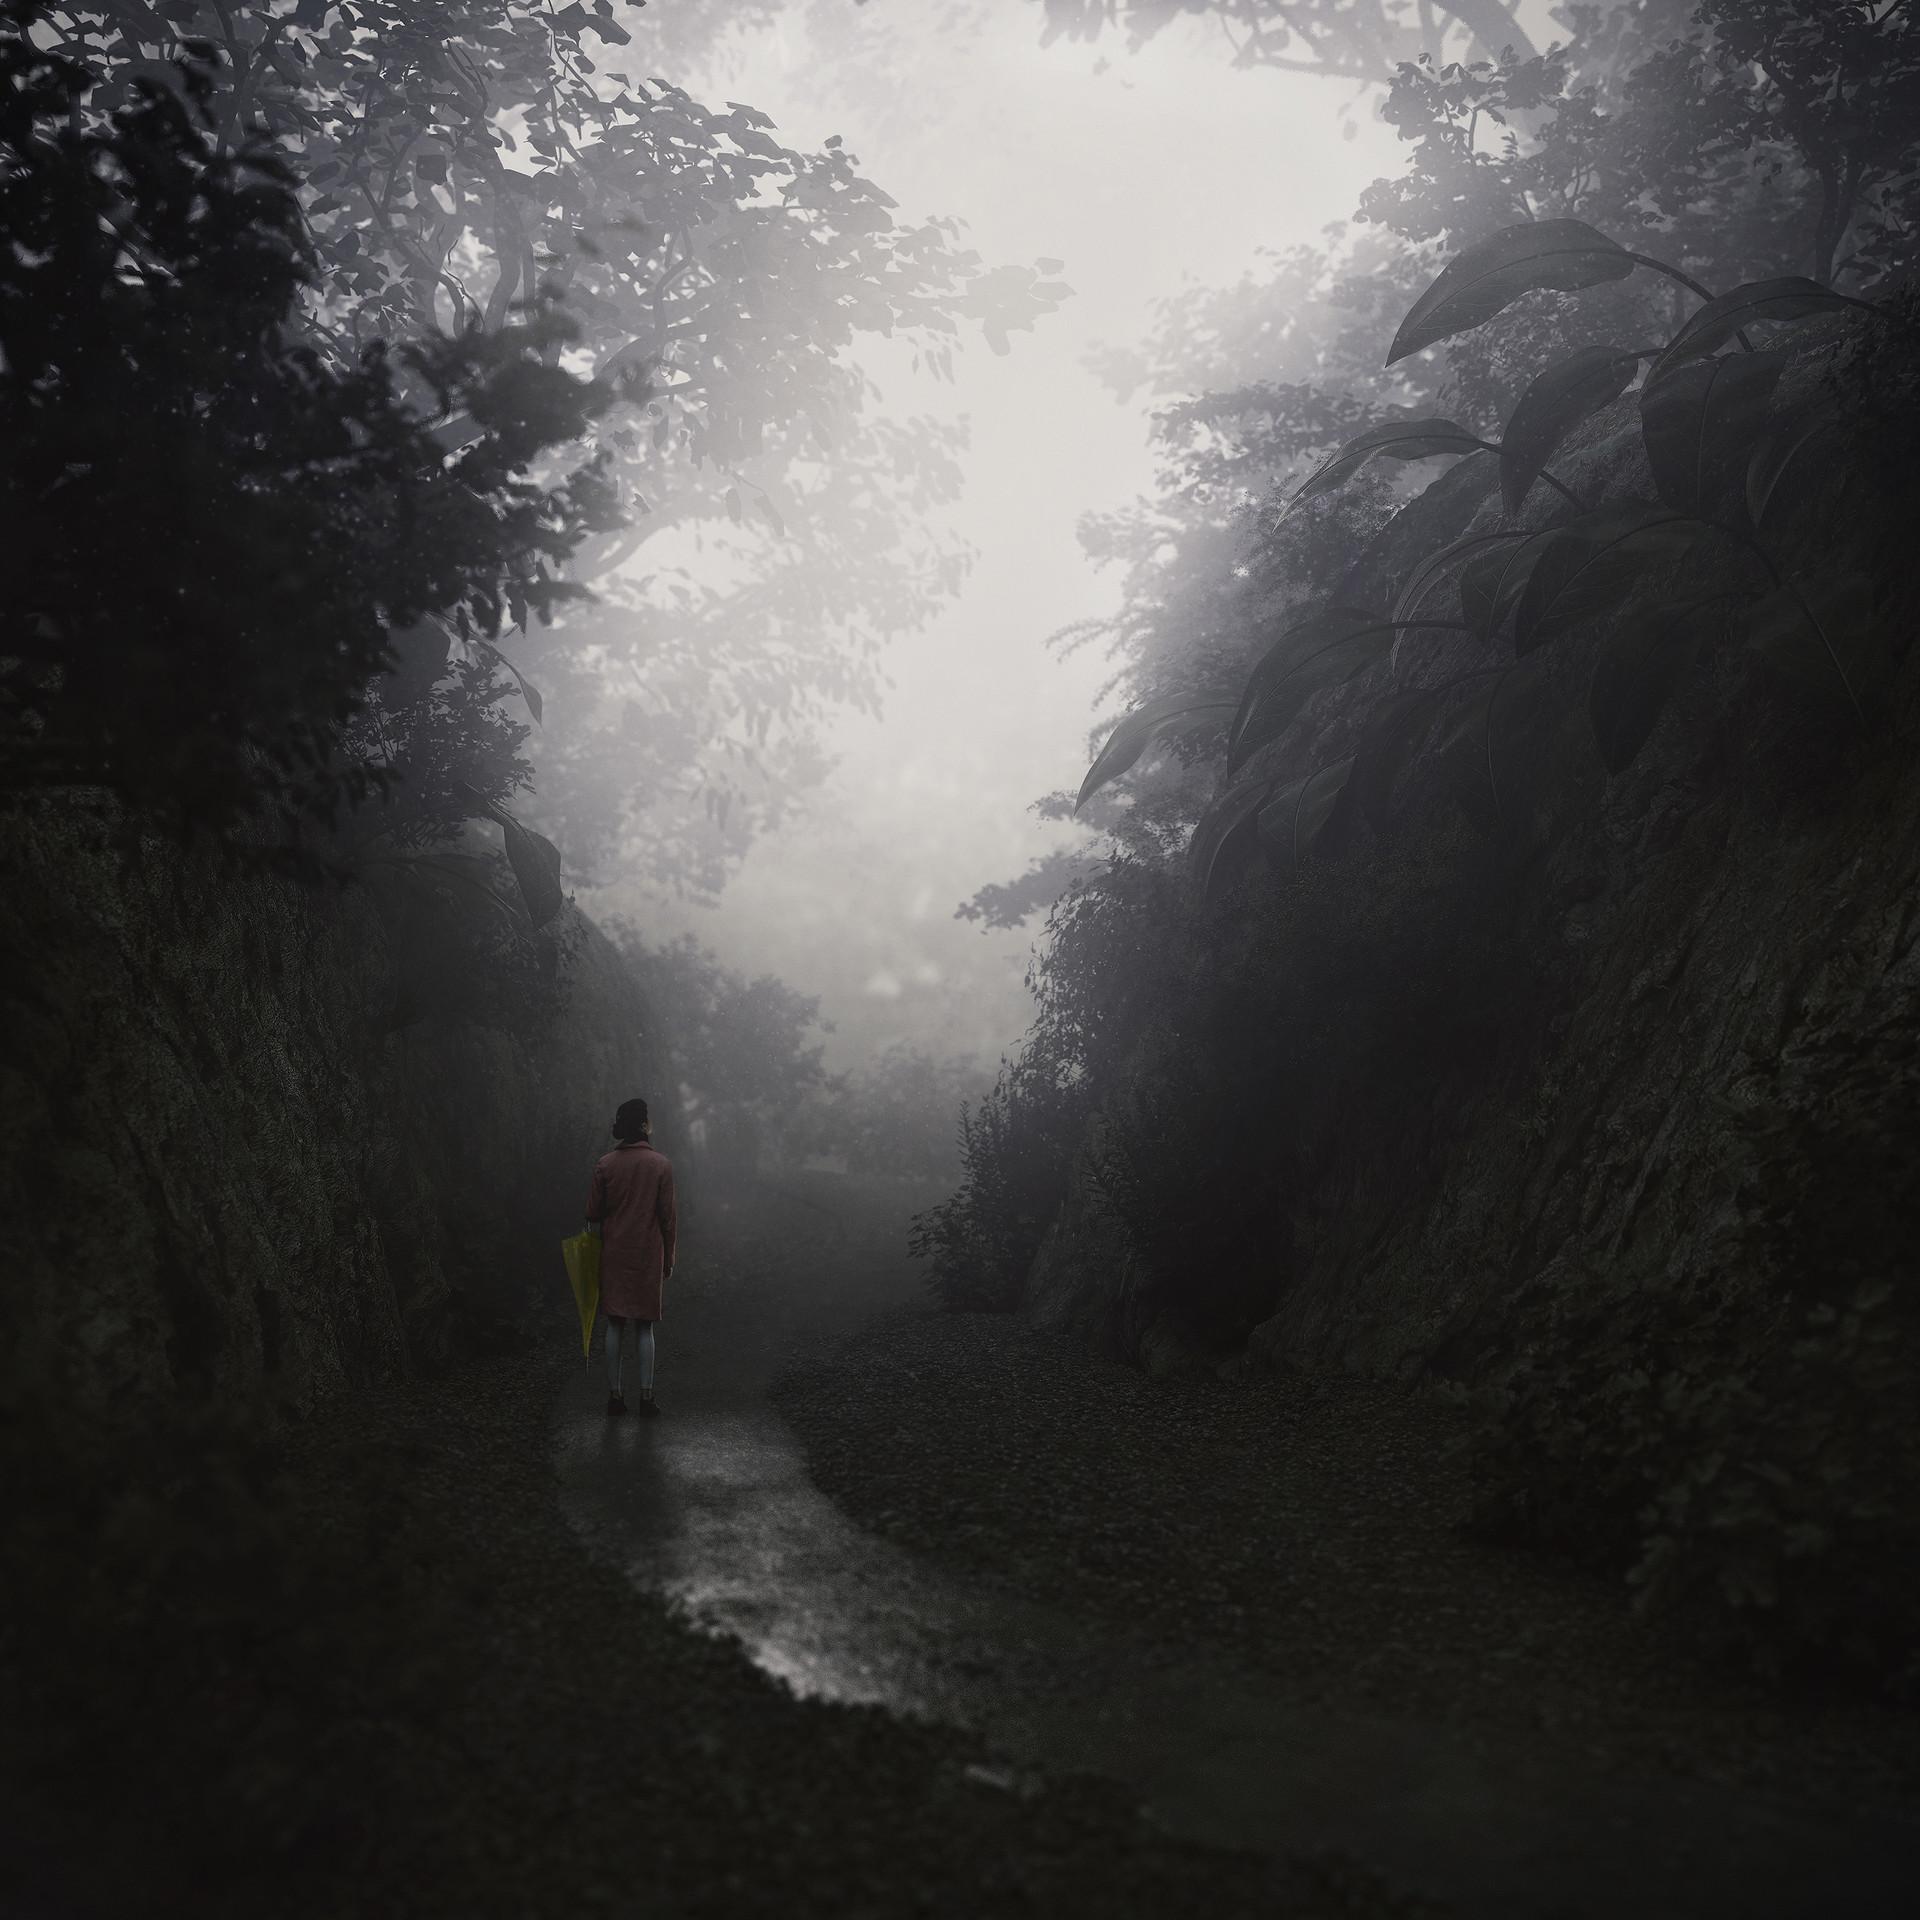 Luis ramos alleywaymid2